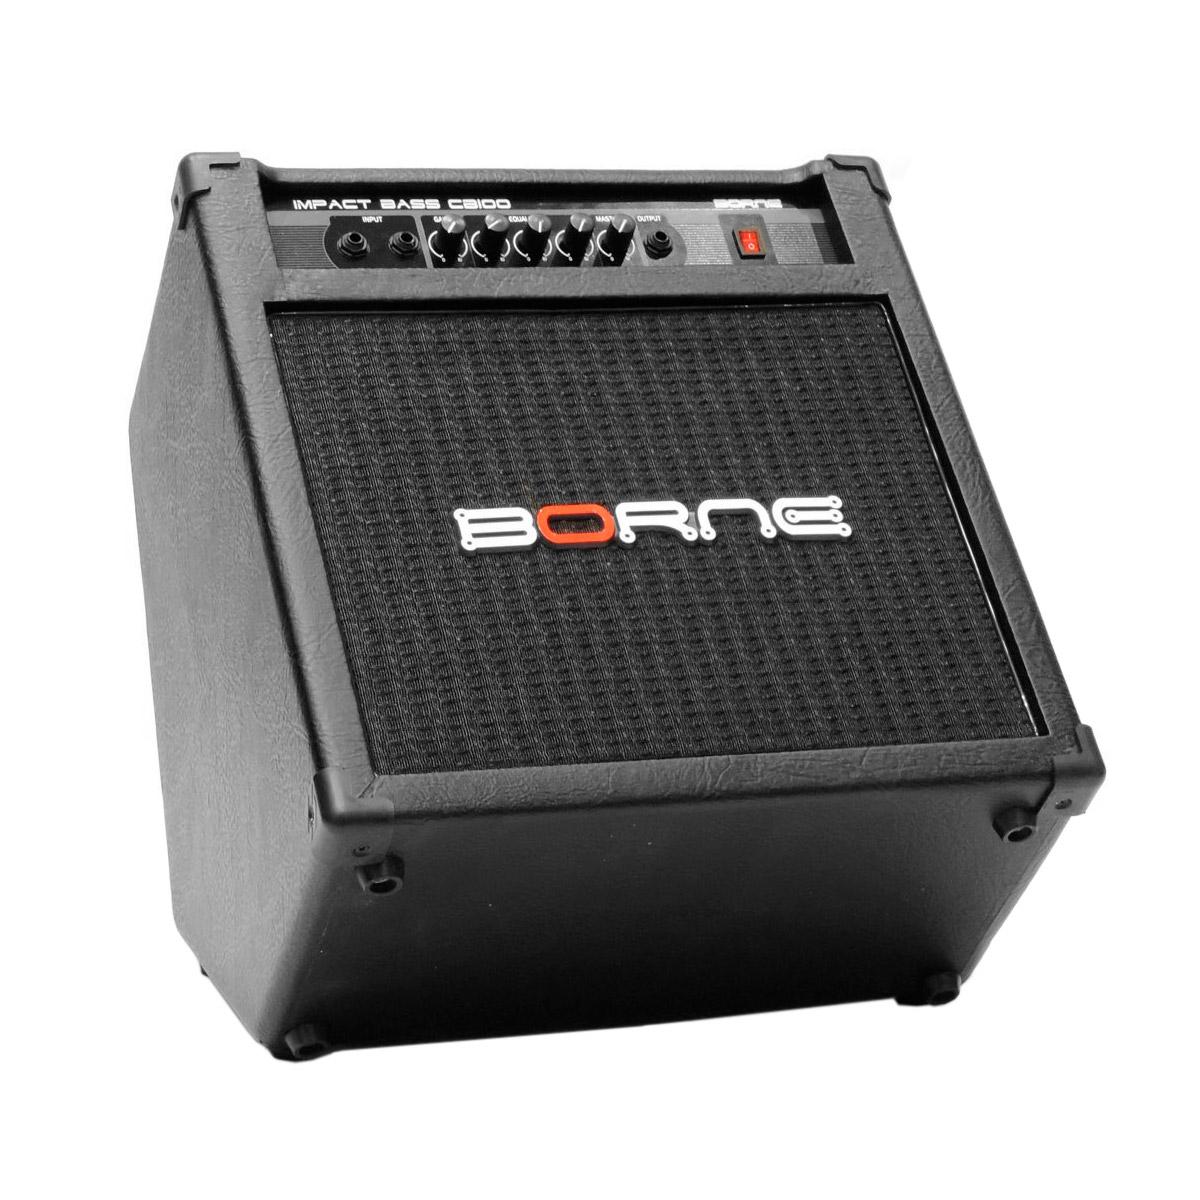 CB100 - Amplificador Combo p/ Contrabaixo 70W Impact Bass CB 100 - Borne